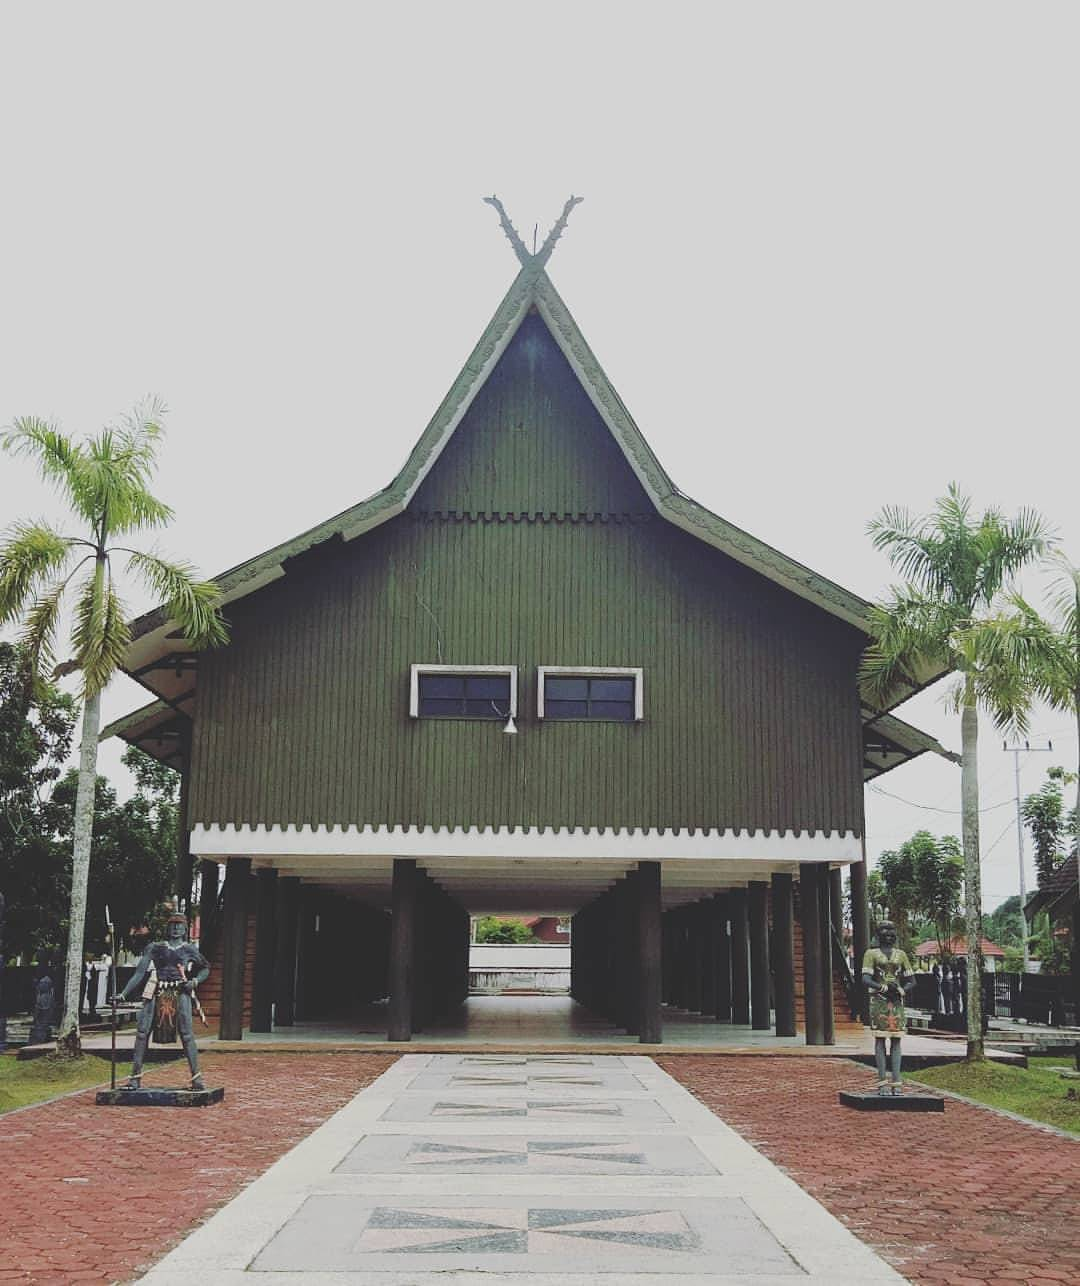 Images Tagged Betang Instagram Eka Tingang Nganderang Rumah Adat Suku